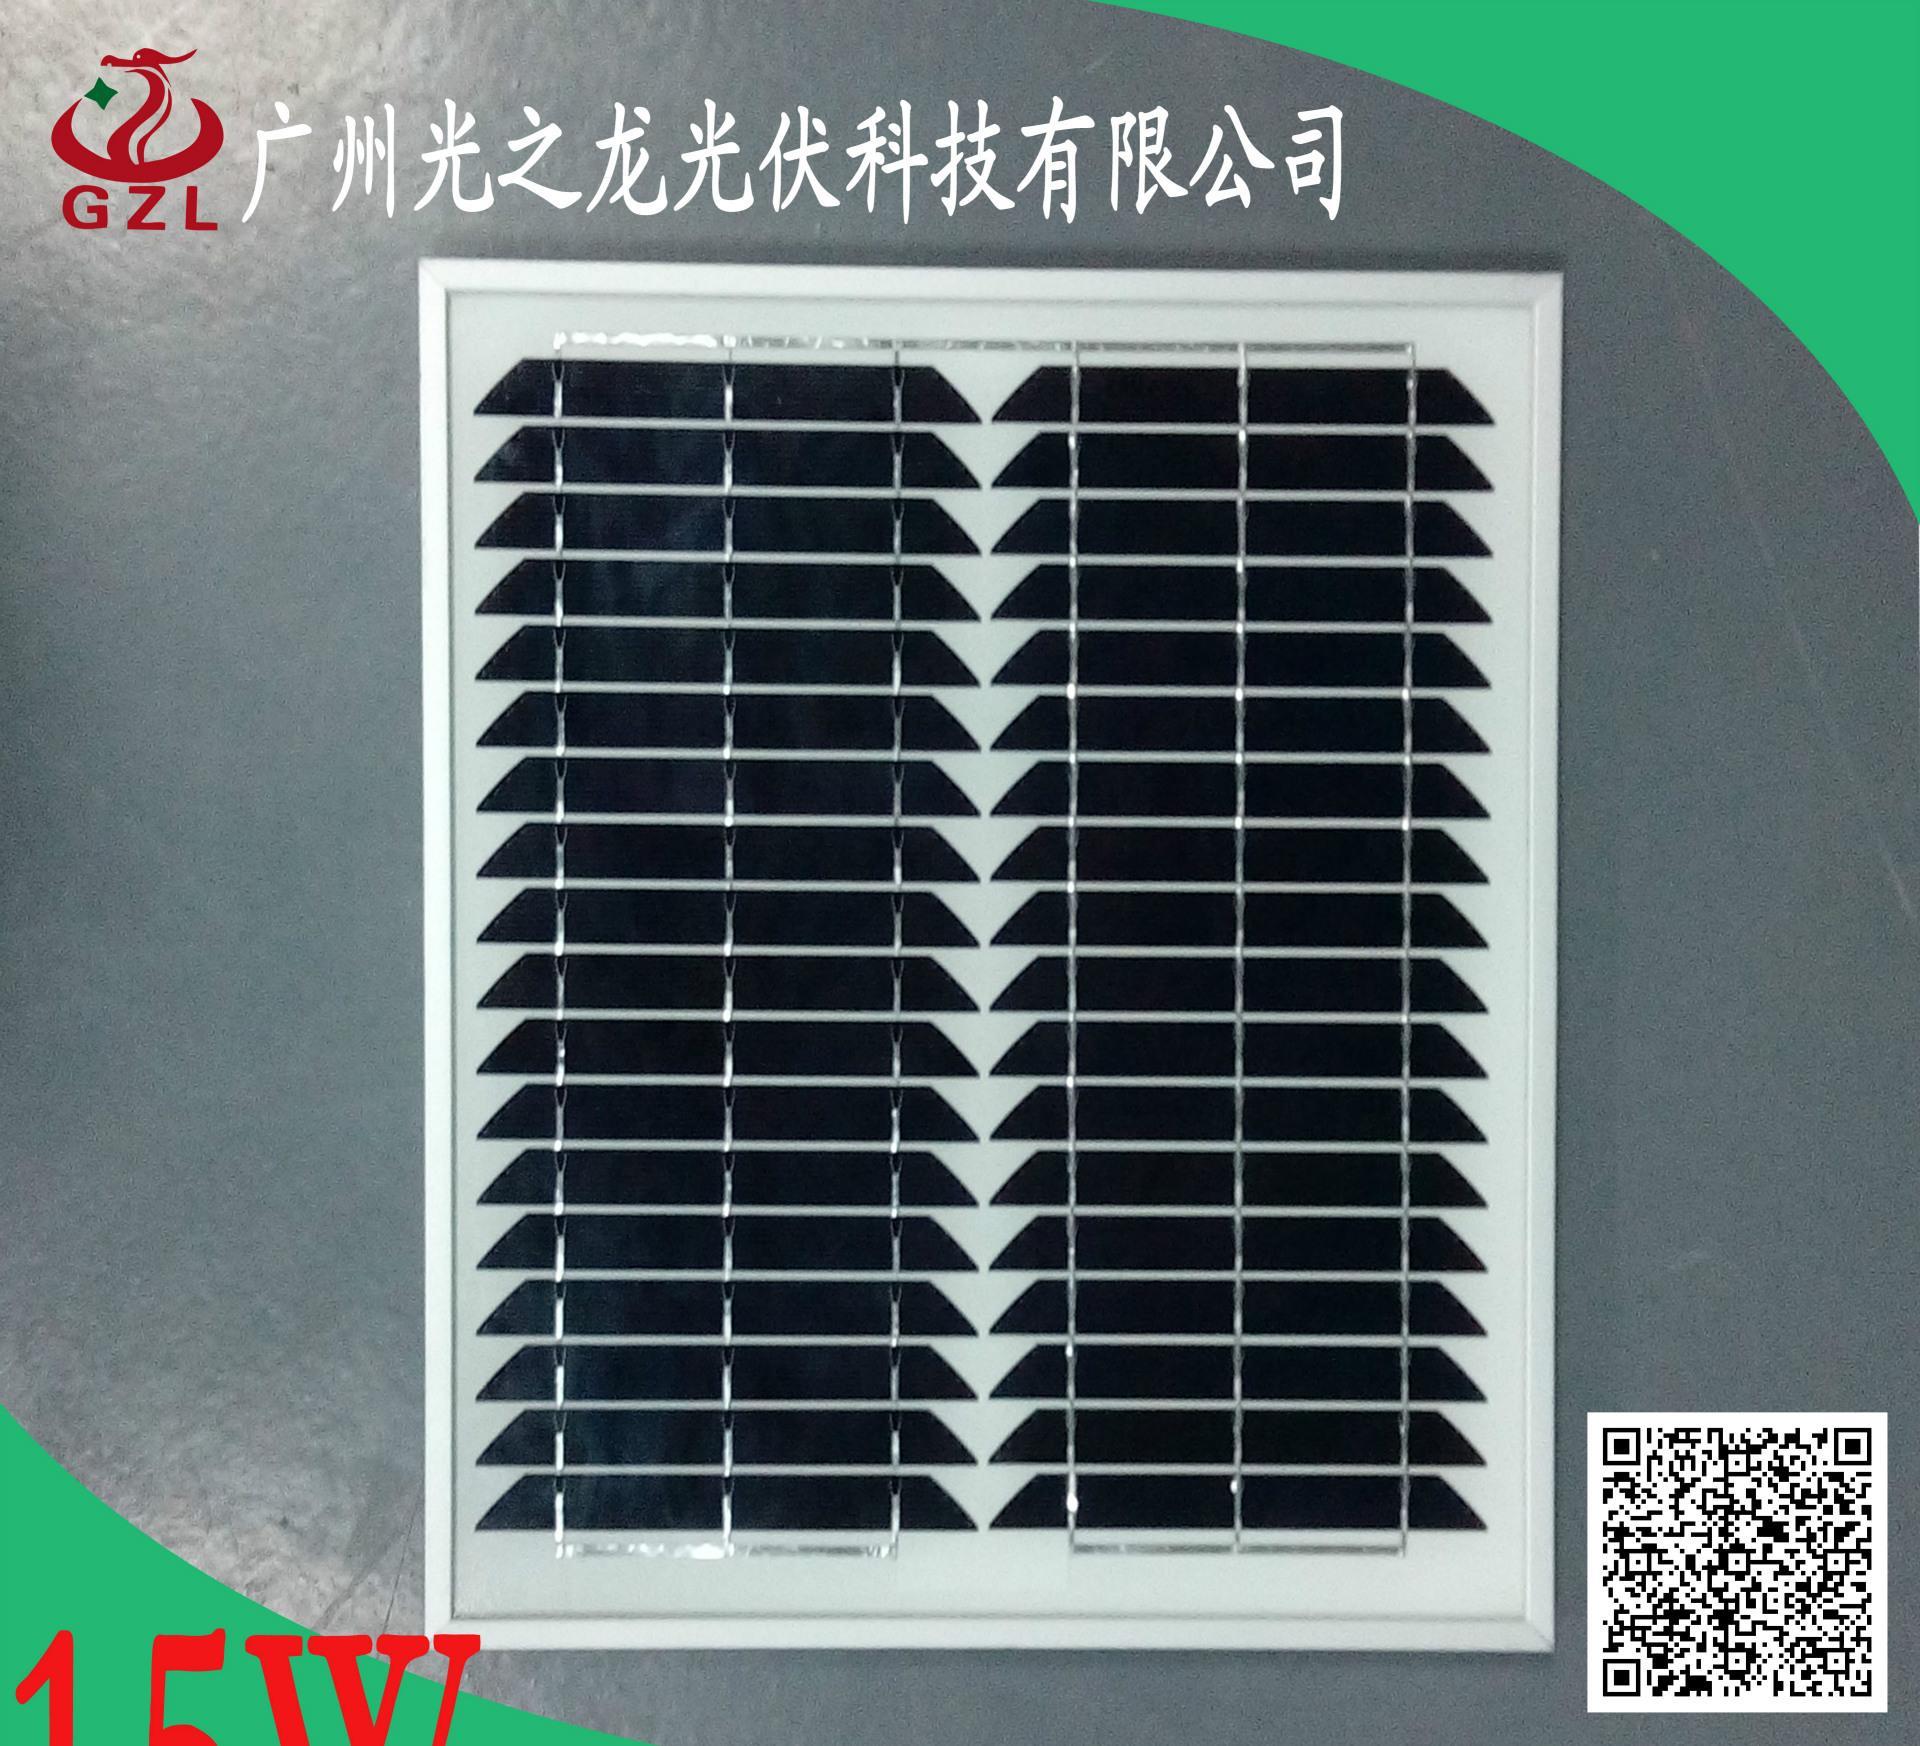 5w 单晶太阳能电池板 太阳能组件 光伏组件 太阳能板